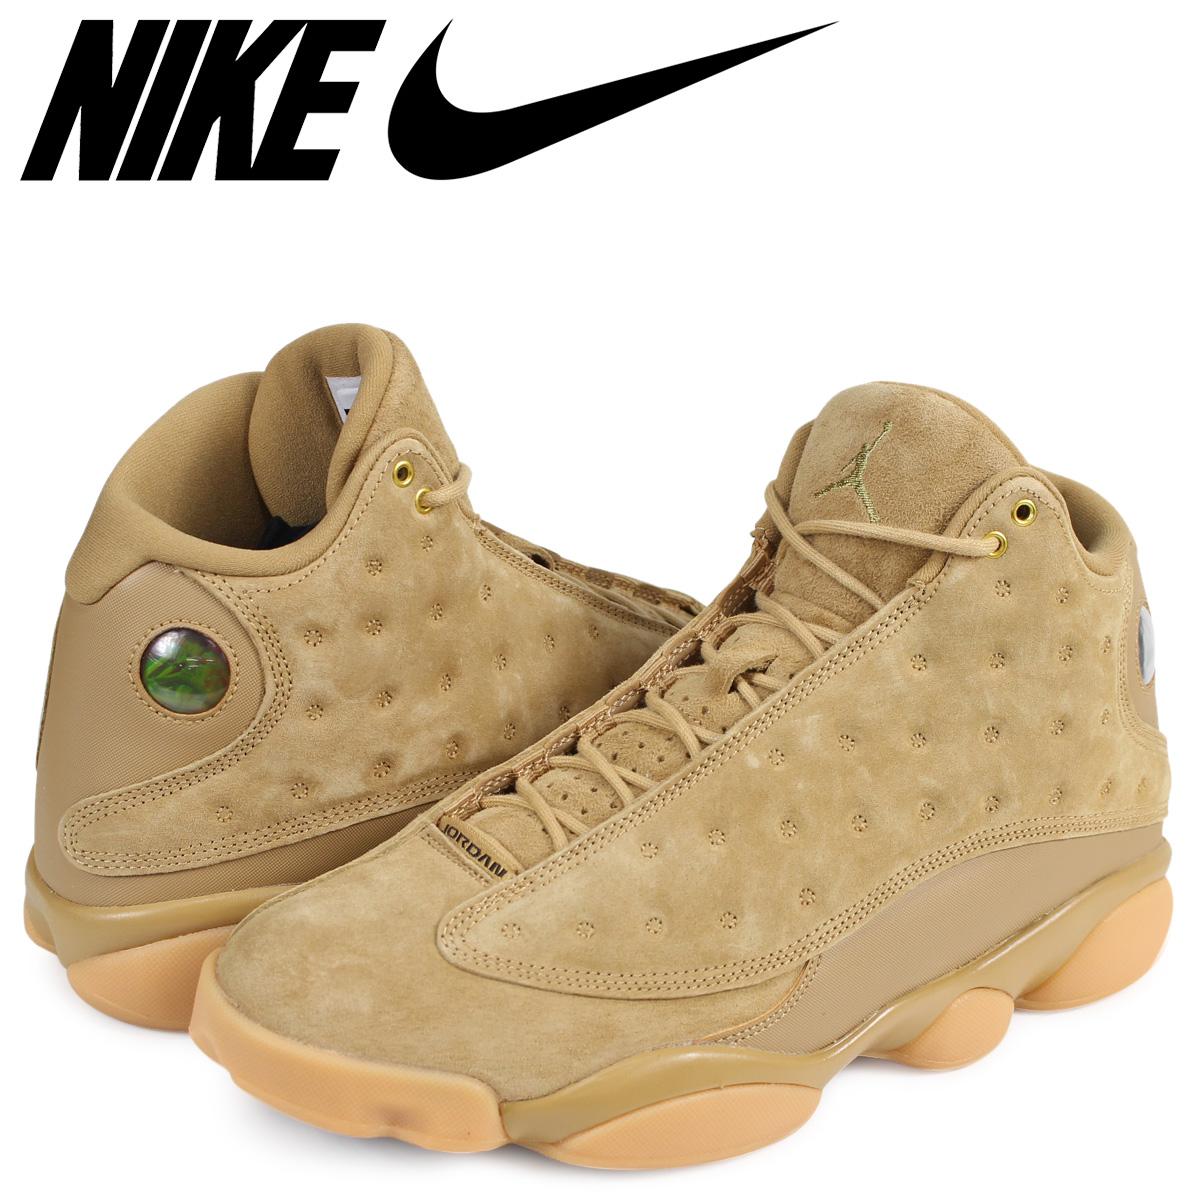 chaussures de sport fea72 0b828 NIKE Nike Air Jordan 13 nostalgic sneakers AIR JORDAN 13 RETRO 414,571-705  men's beige